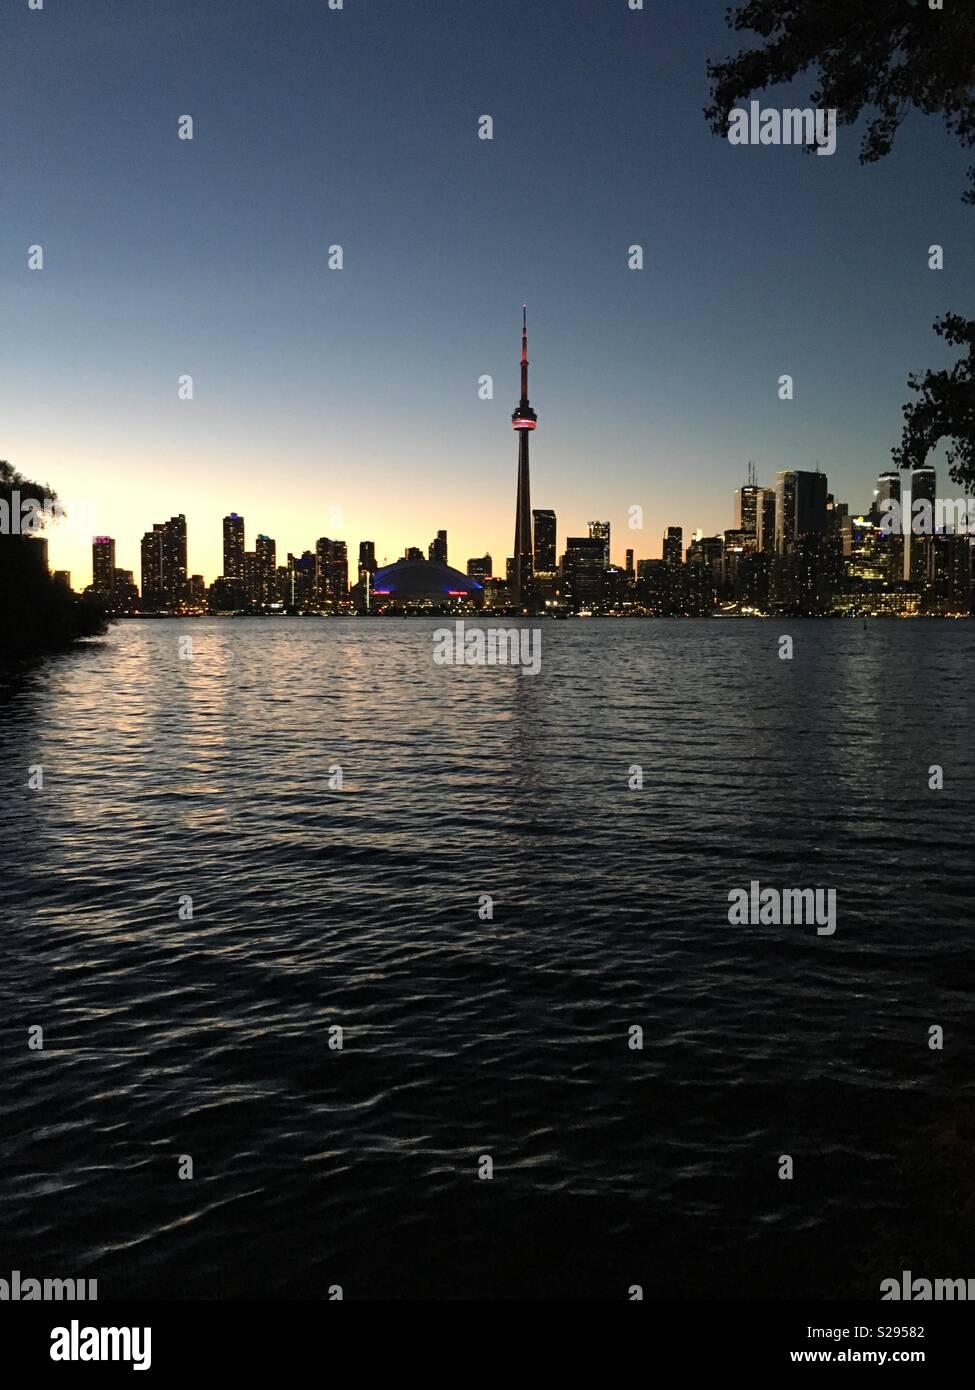 Toronto at dusk from Toronto island - Stock Image